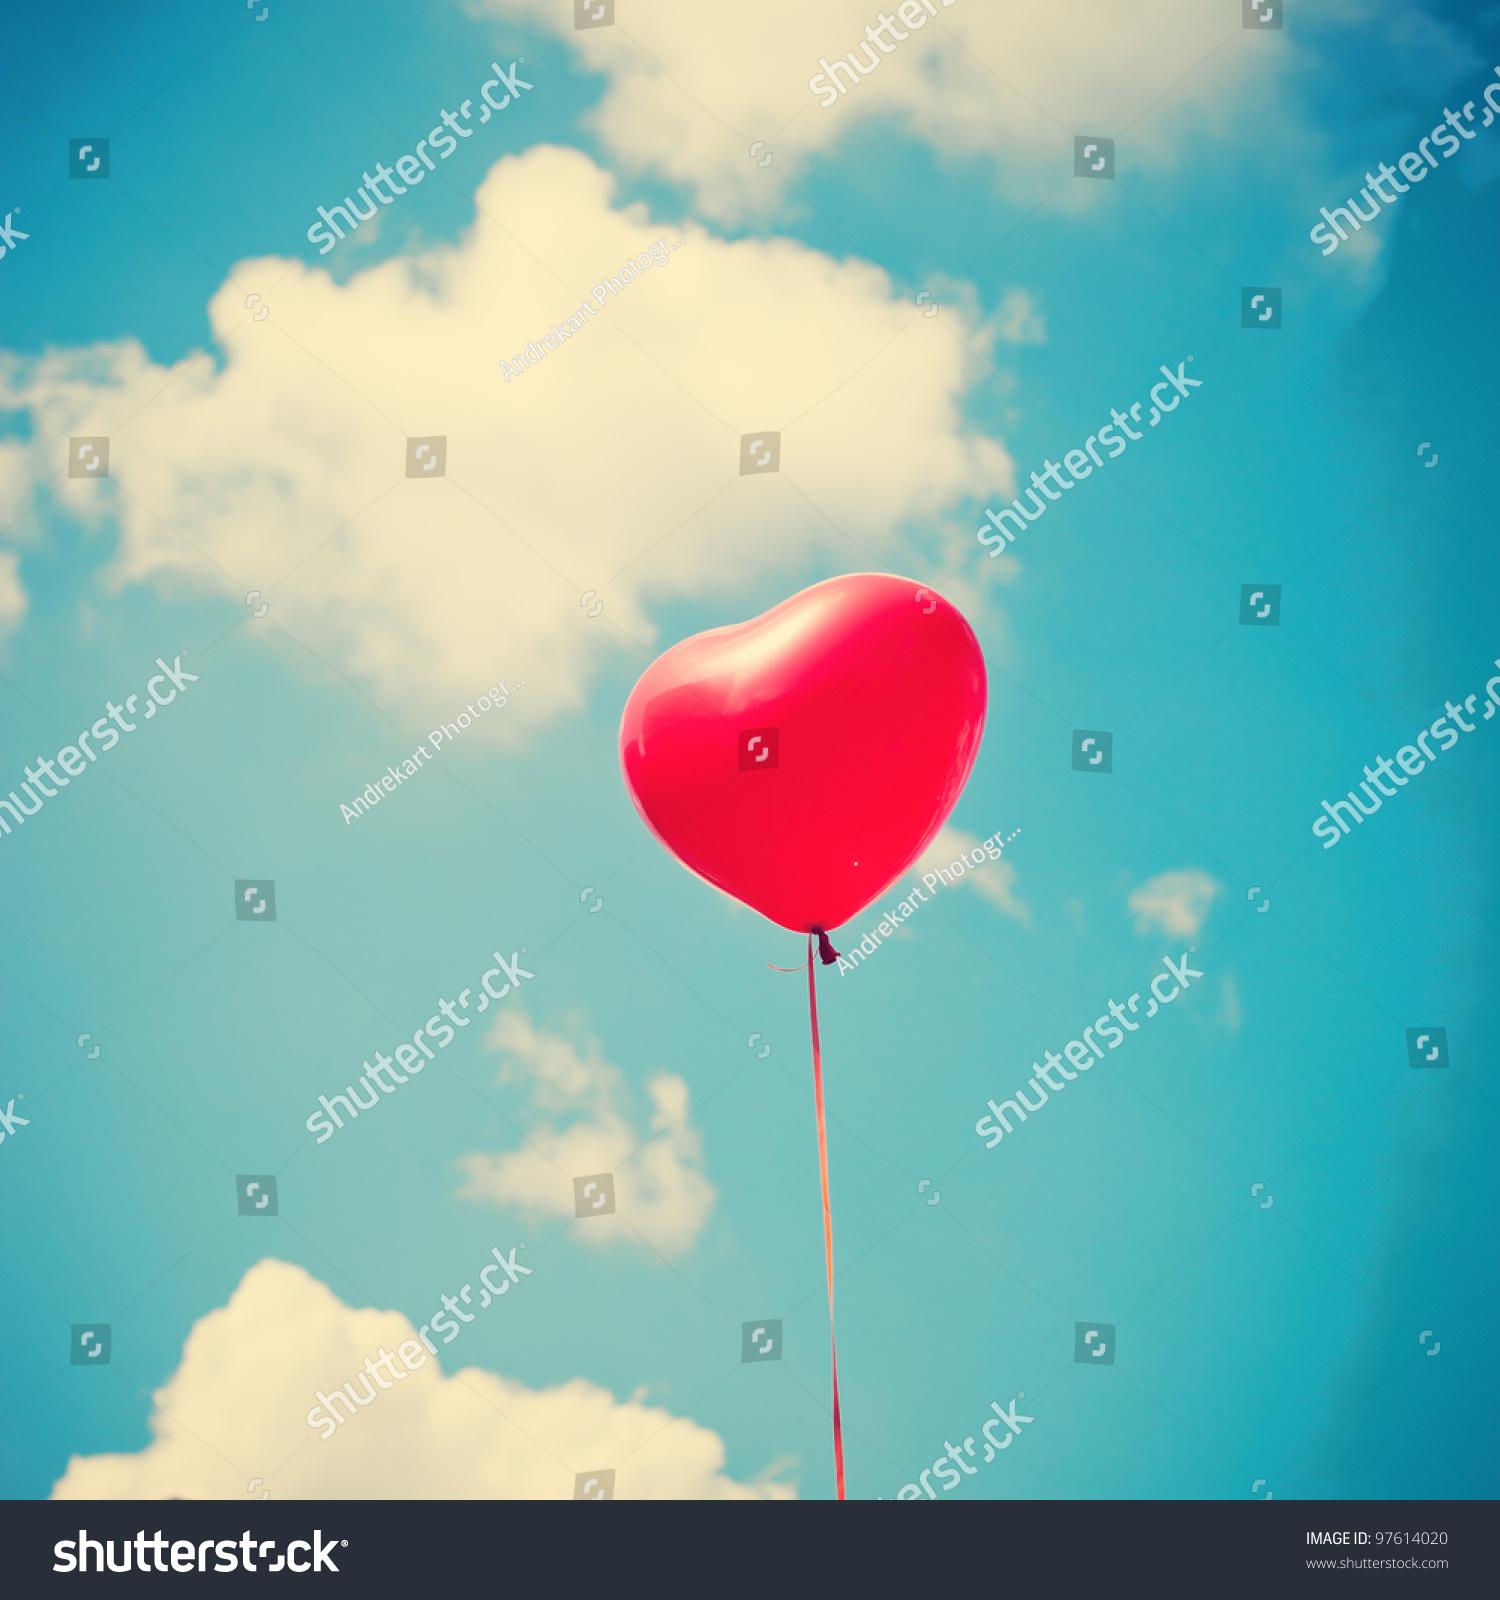 Heart balloon stock photo 97614020 shutterstock - How to make heart balloon ...